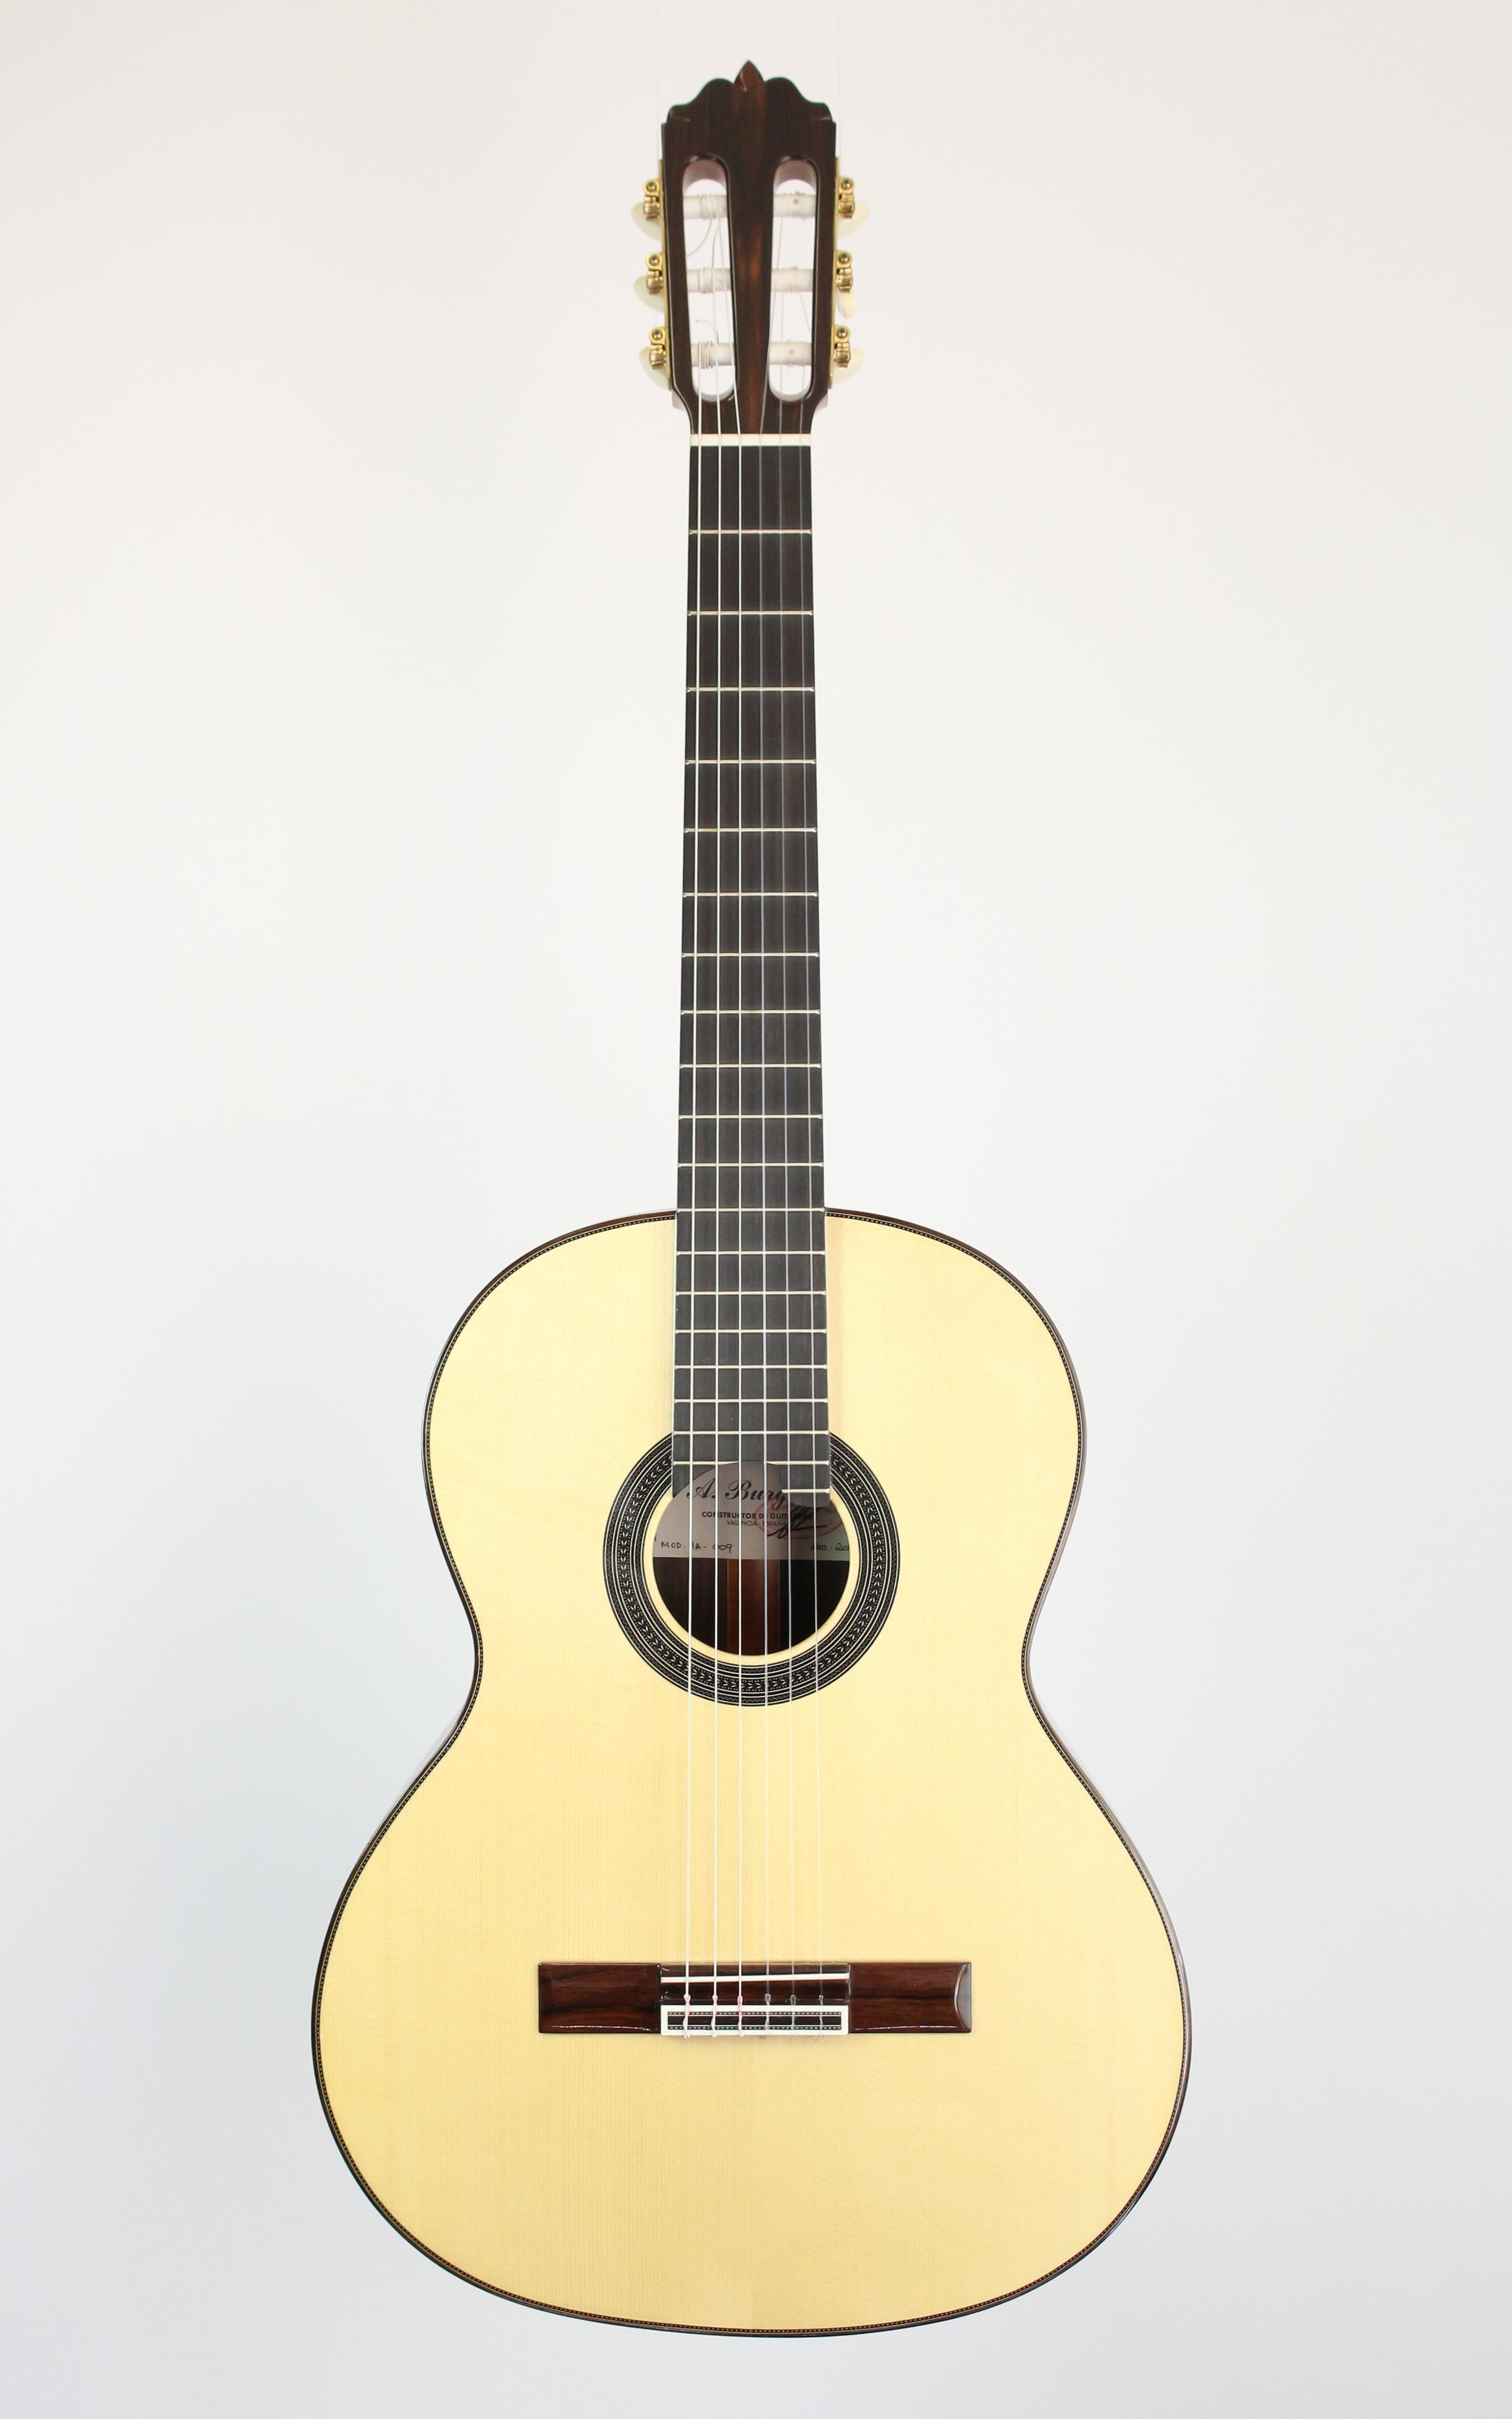 Amalio Burguet - 1A Fichte - Gitarren - Konzertgitarren | MUSIK BERTRAM Deutschland Freiburg